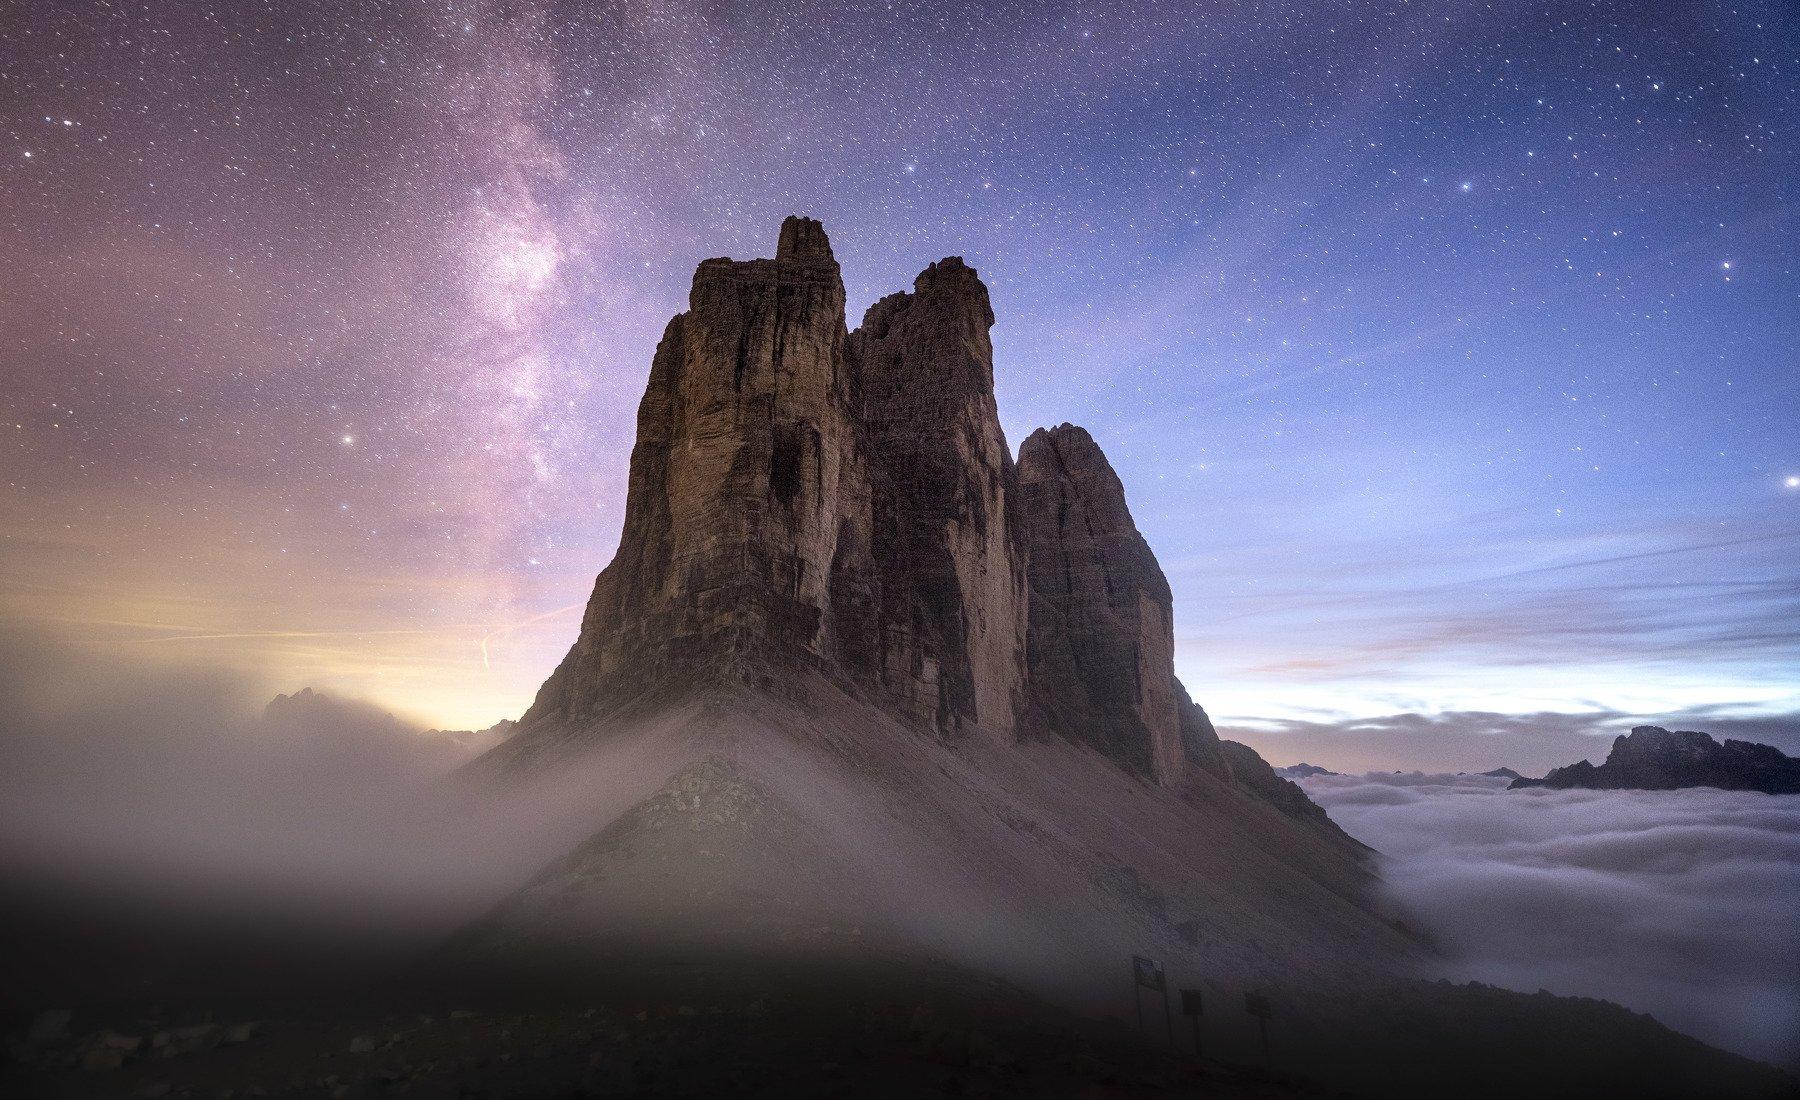 Italy, Tre Cime, Night, Milky Way, Mountains, Fog, Landscape, Sylwia Grabinska